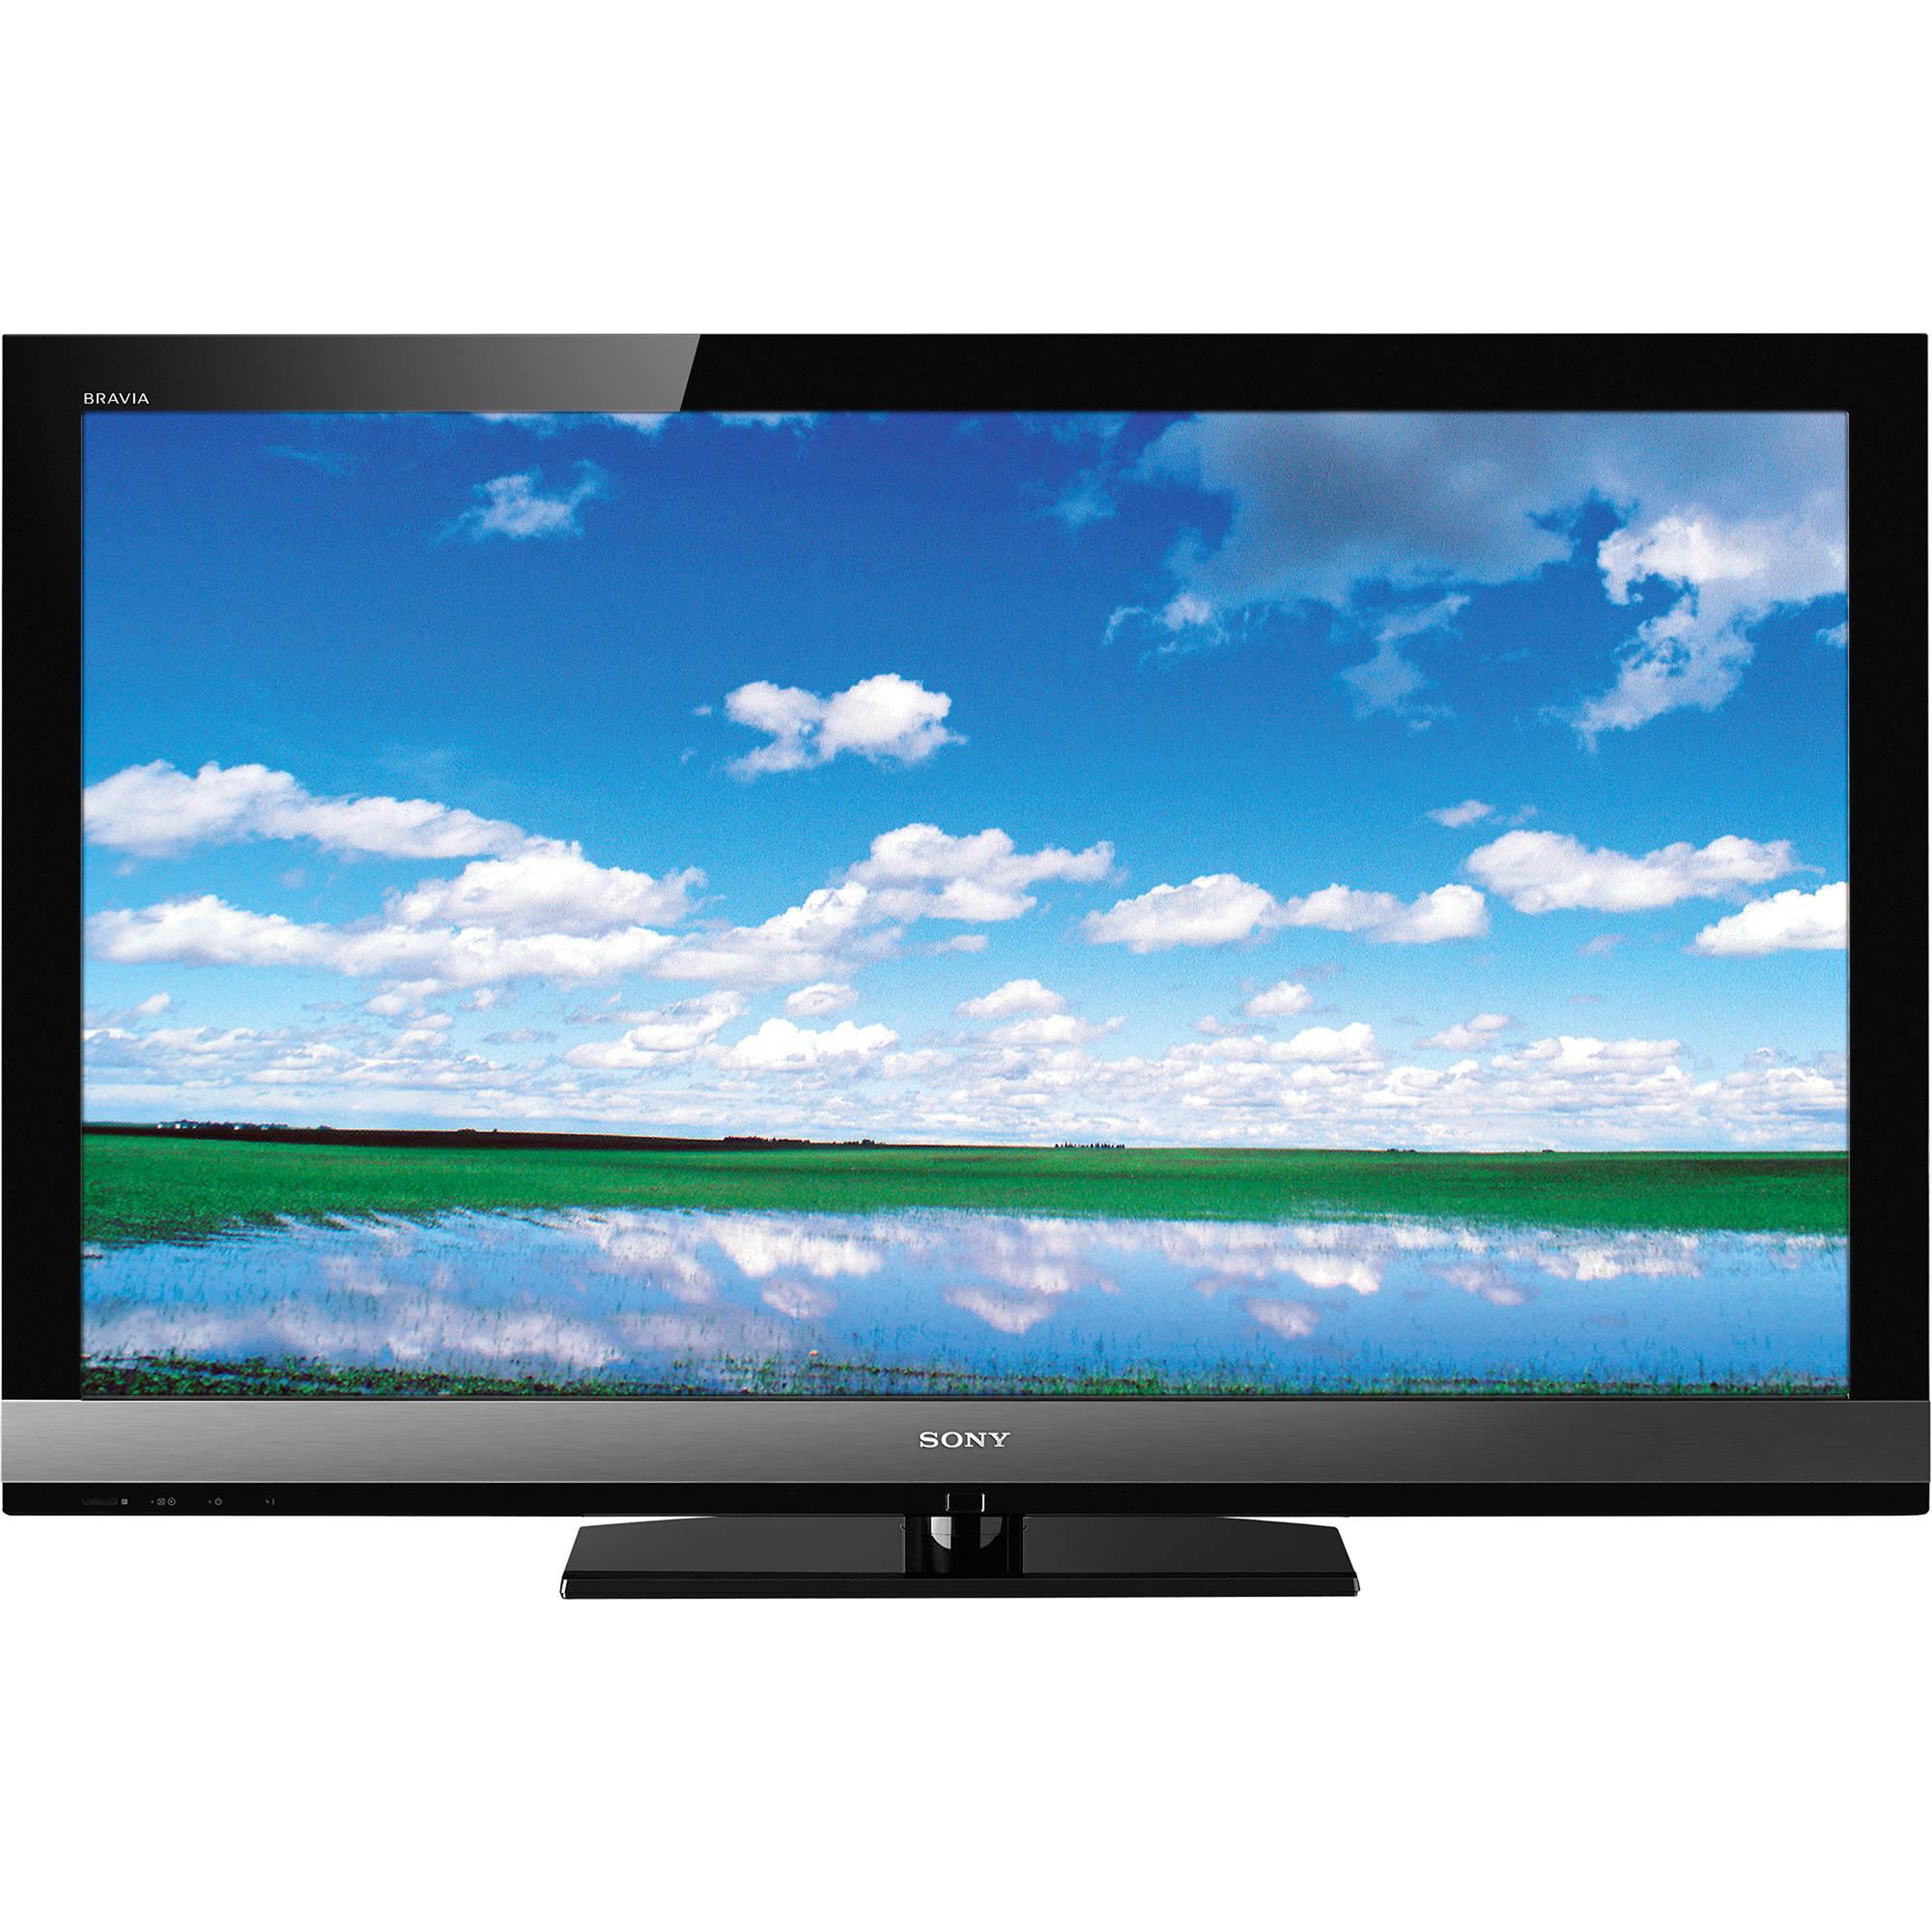 New Driver: Sony KDL-22EX325 BRAVIA HDTV